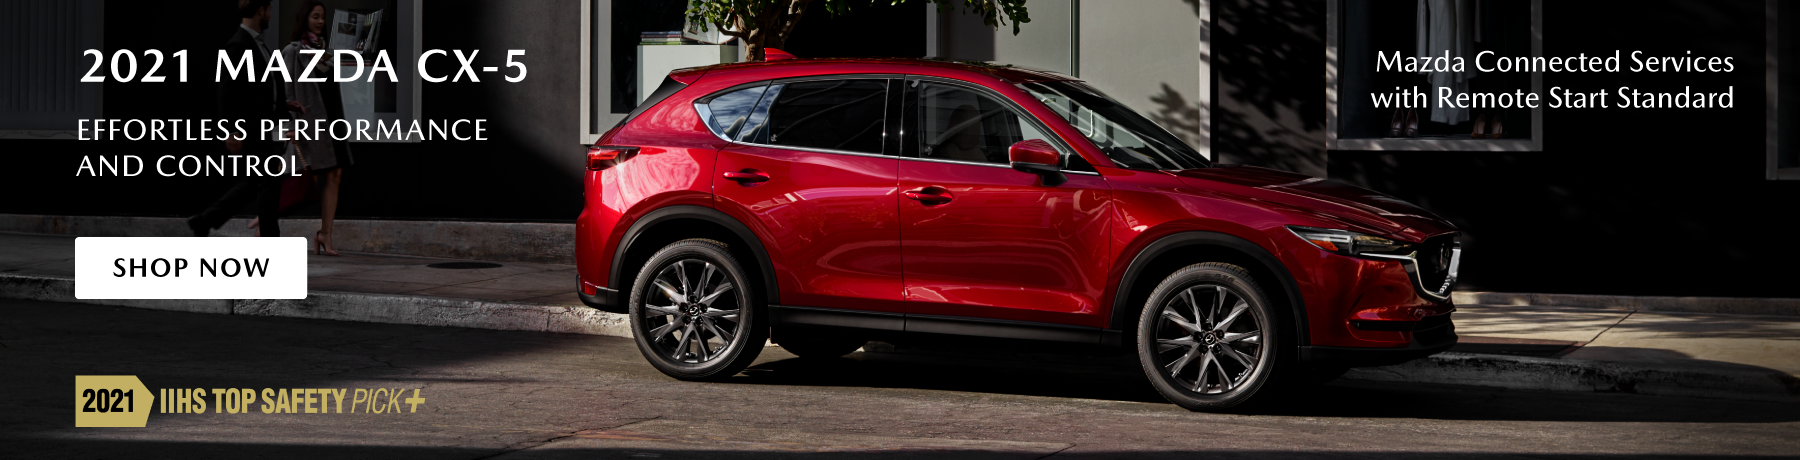 MazdaPlace-OEM-0921_CX5